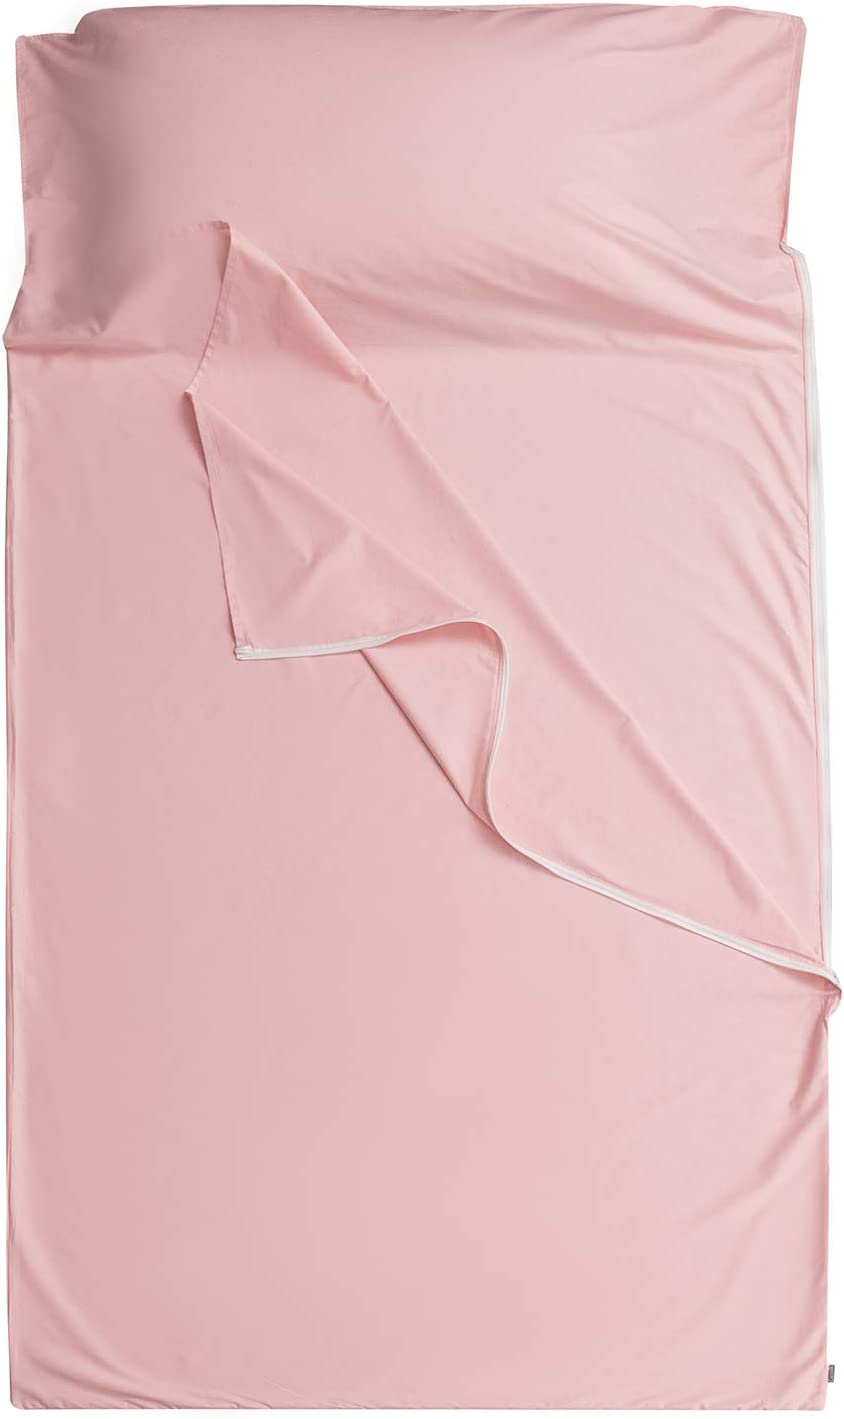 100/% Cotton Sleep Sacks Adults Cozysilk Sleeping Bag Liner Camping Sheets Hotel Travel Sheets with Full Length Tearaway Zipper